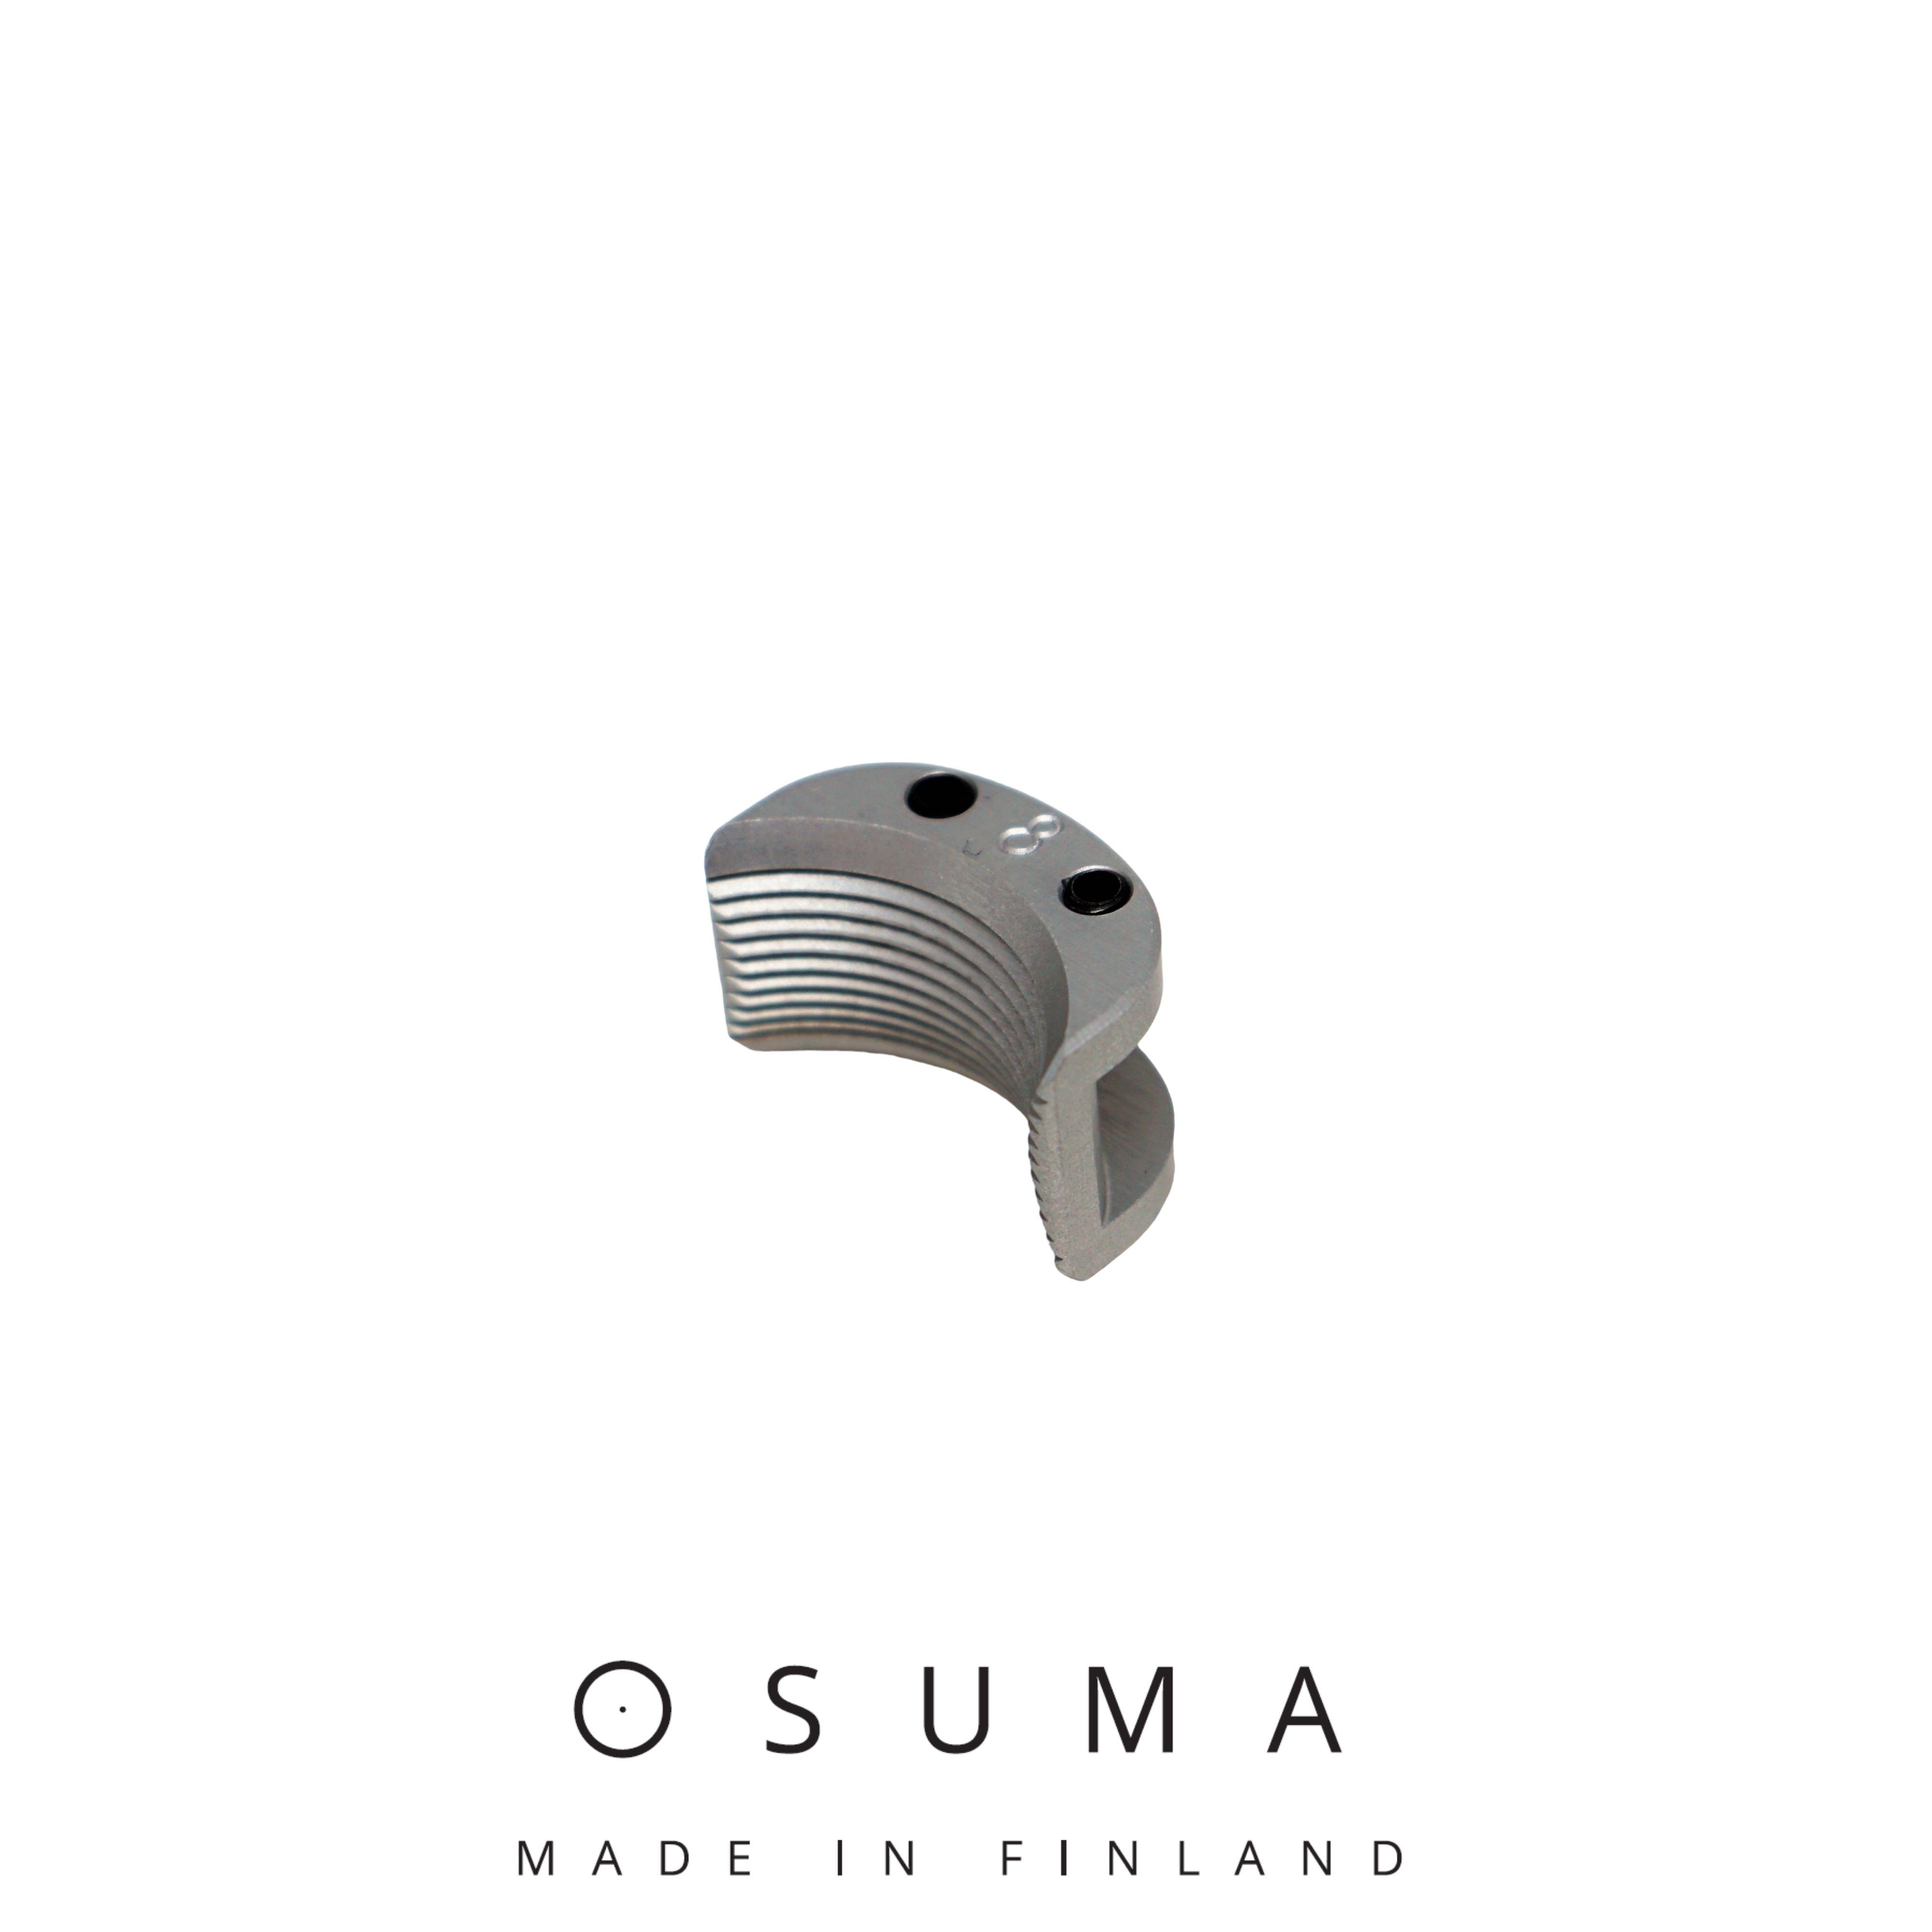 Osuma Liipaisimenlevennin 8 mm